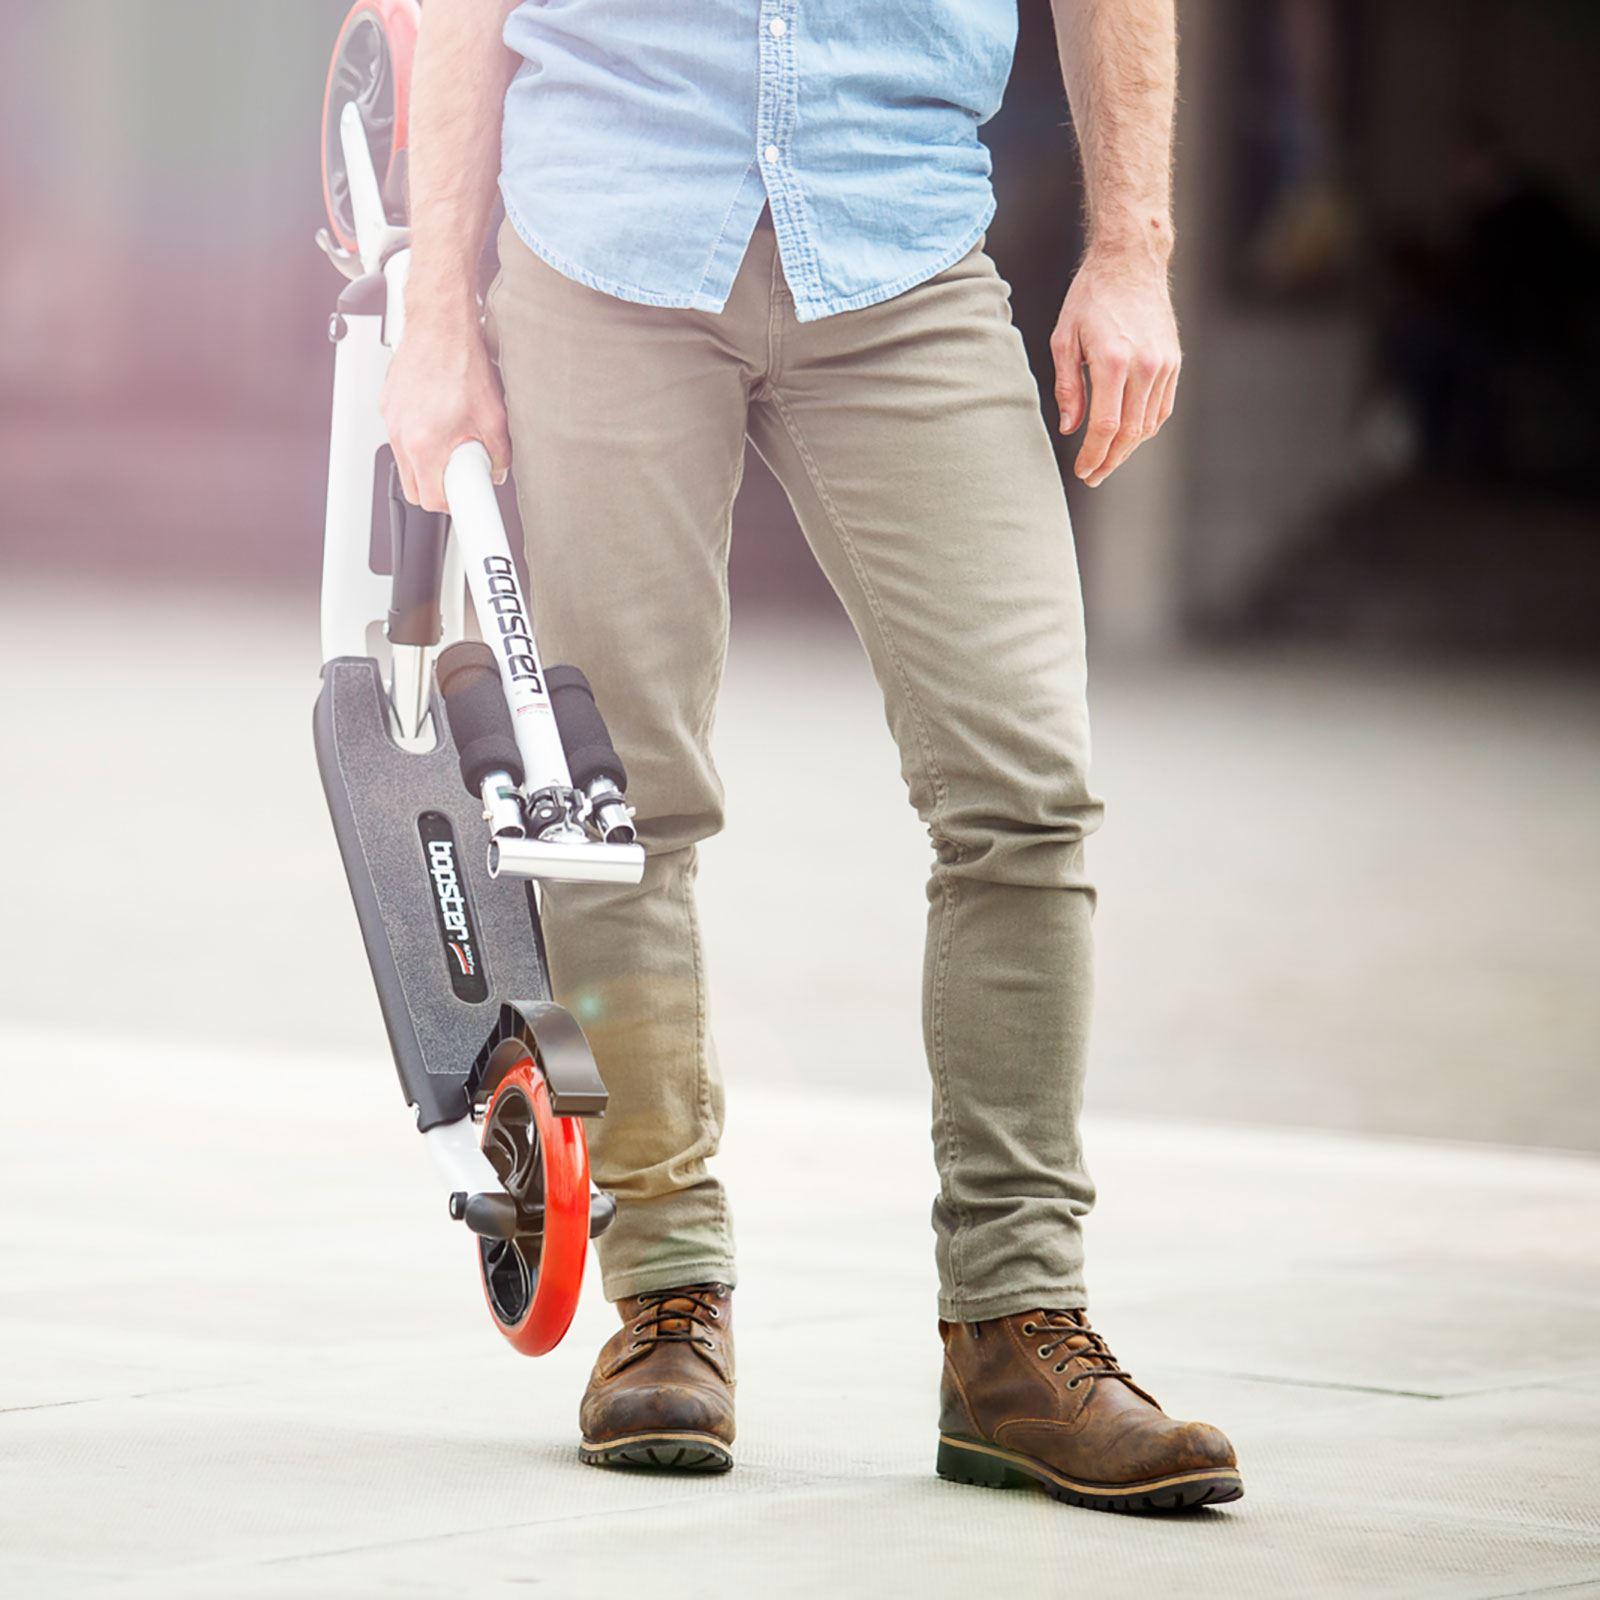 Indexbild 2 - Bopster Sport Pro - Erwachsene Rapid Faltbar Urban Kick Pendler Scooter -